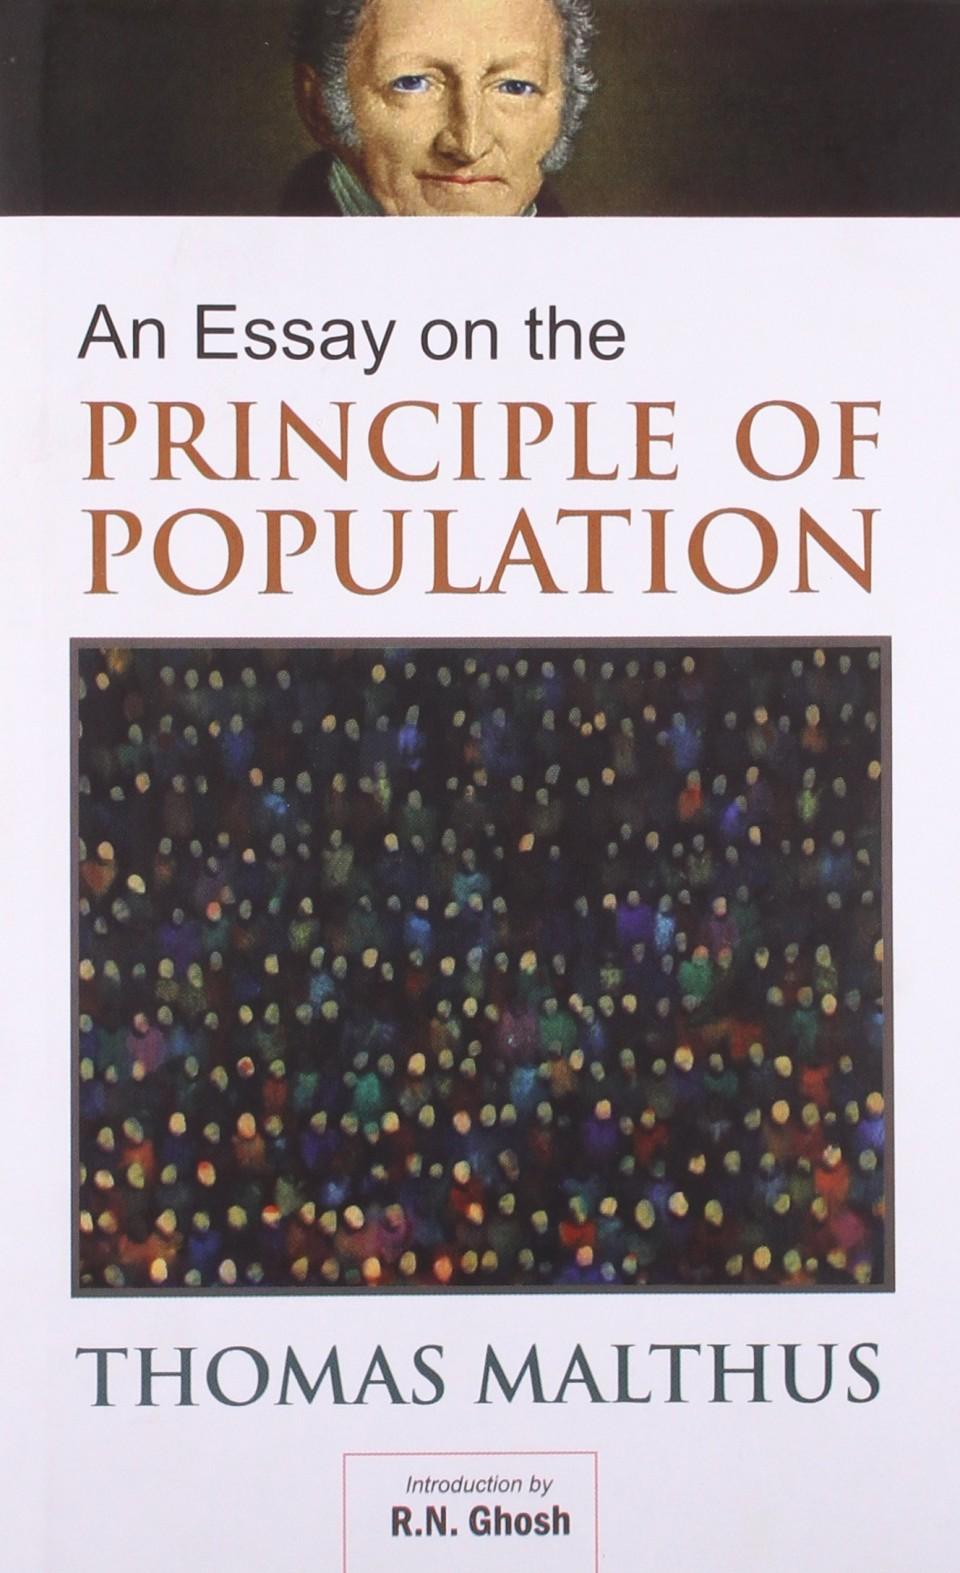 006 Essay On The Principle Of Population 8162bfm1ycfl Singular Malthus Sparknotes Thomas Main Idea 960